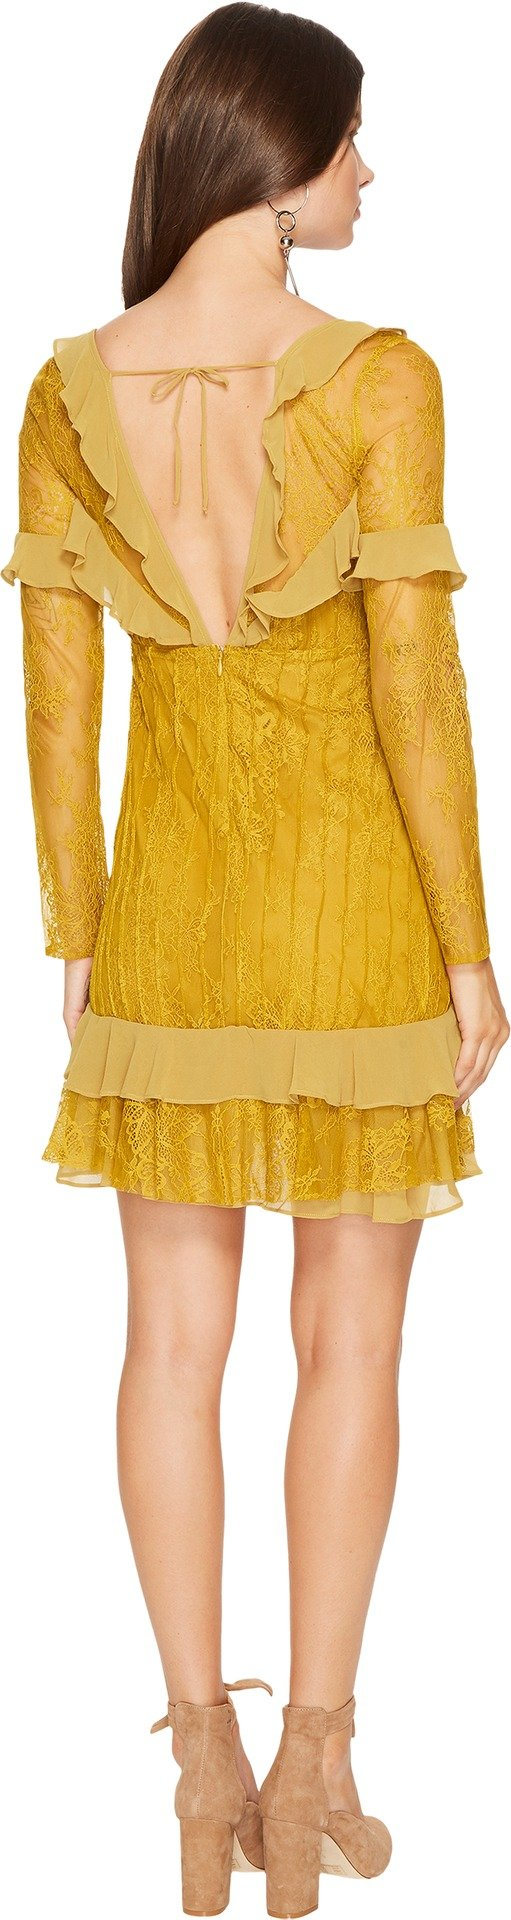 For Love & Lemons Women's Daphne Lace Mini Dress, Chartreuse, Small